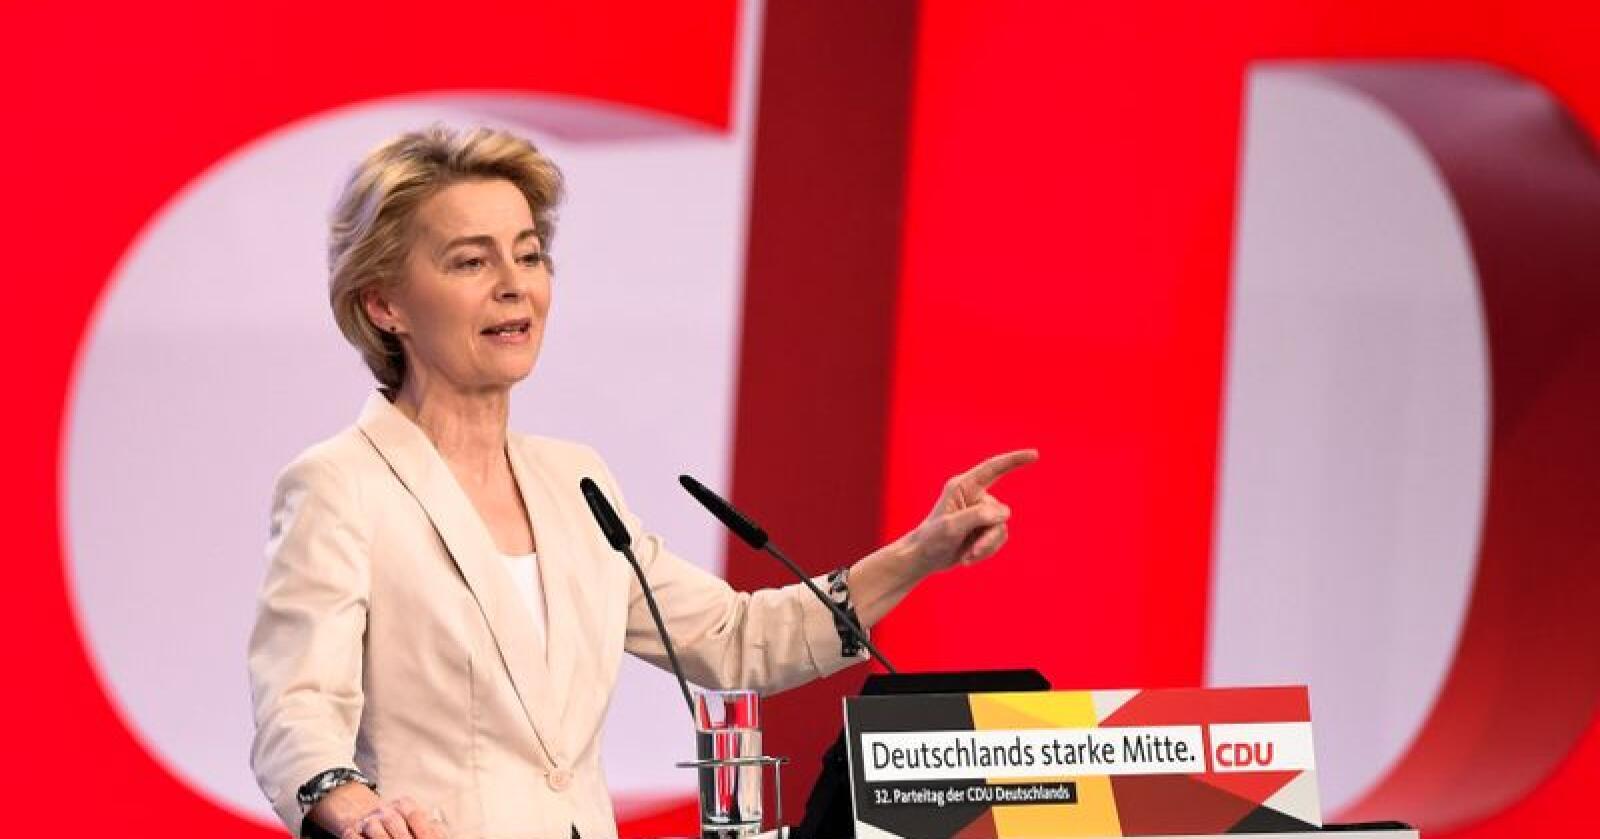 Alt ligger nå til rette for at EU-parlamentet kan godkjenne Ursula von der Leyens nye EU-kommisjon, til tross for at den ikke har en kommissær fra hvert medlemsland. Arkivfoto: Jens Meyer / AP / NTB scanpix